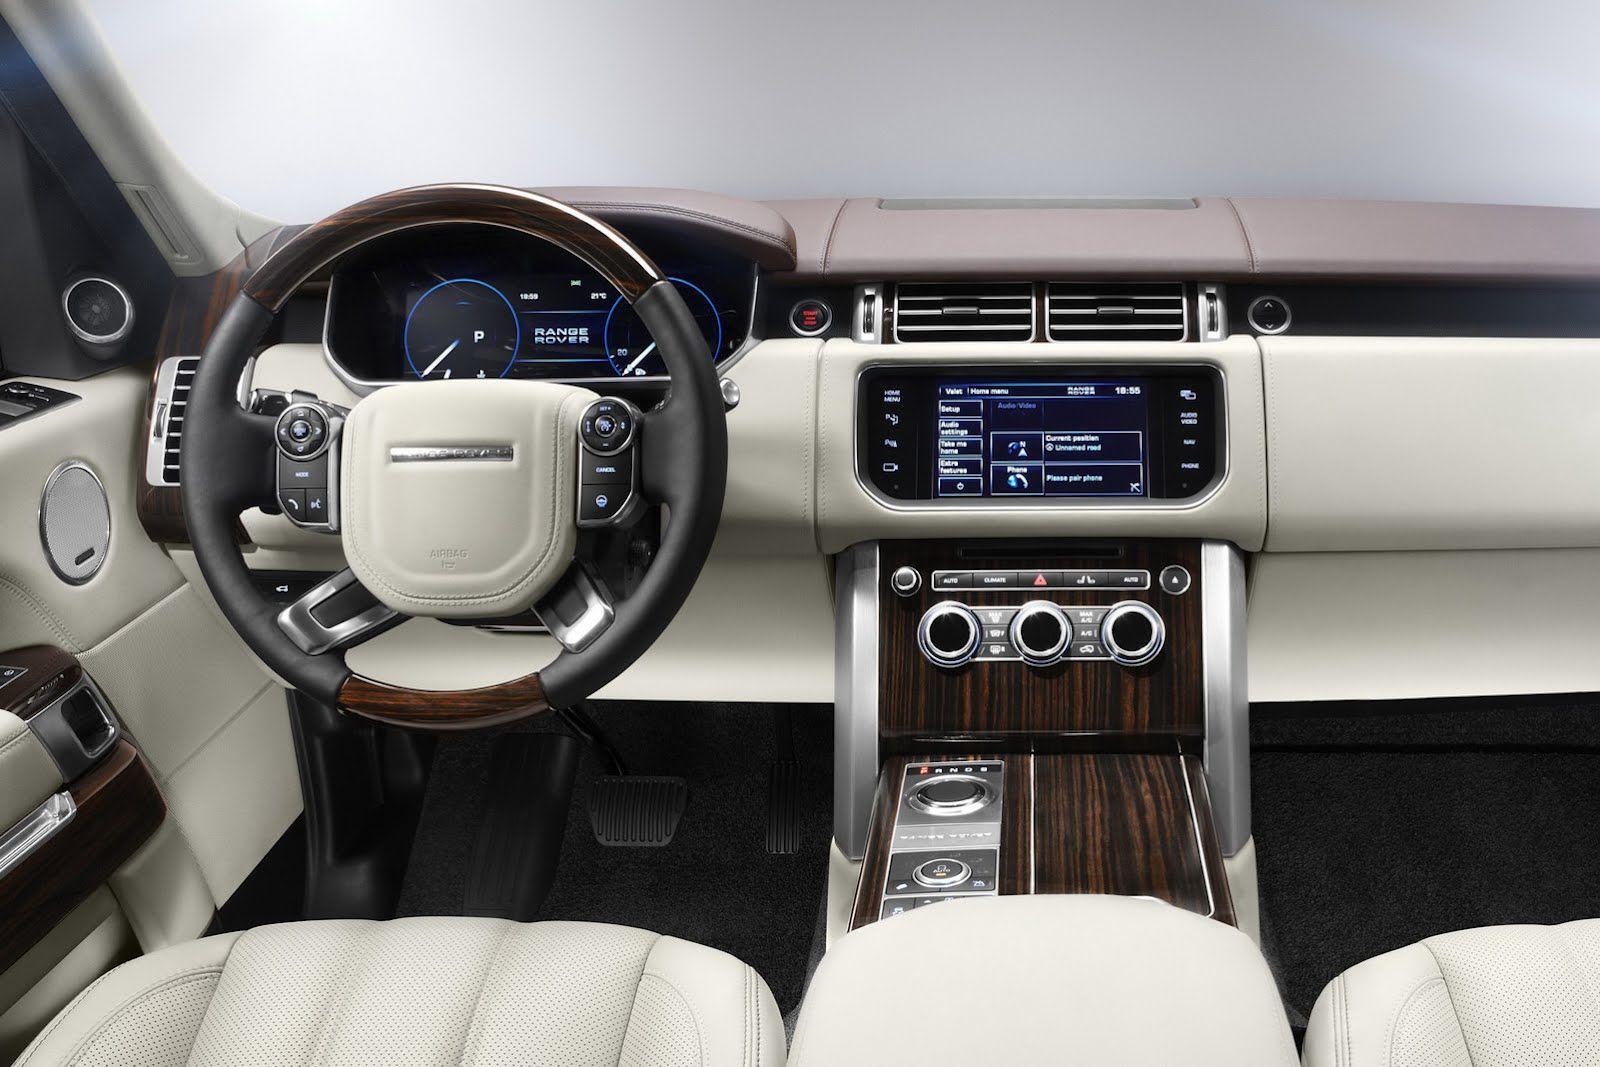 New Range Rover Range Rover Evoque Interior Range Rover